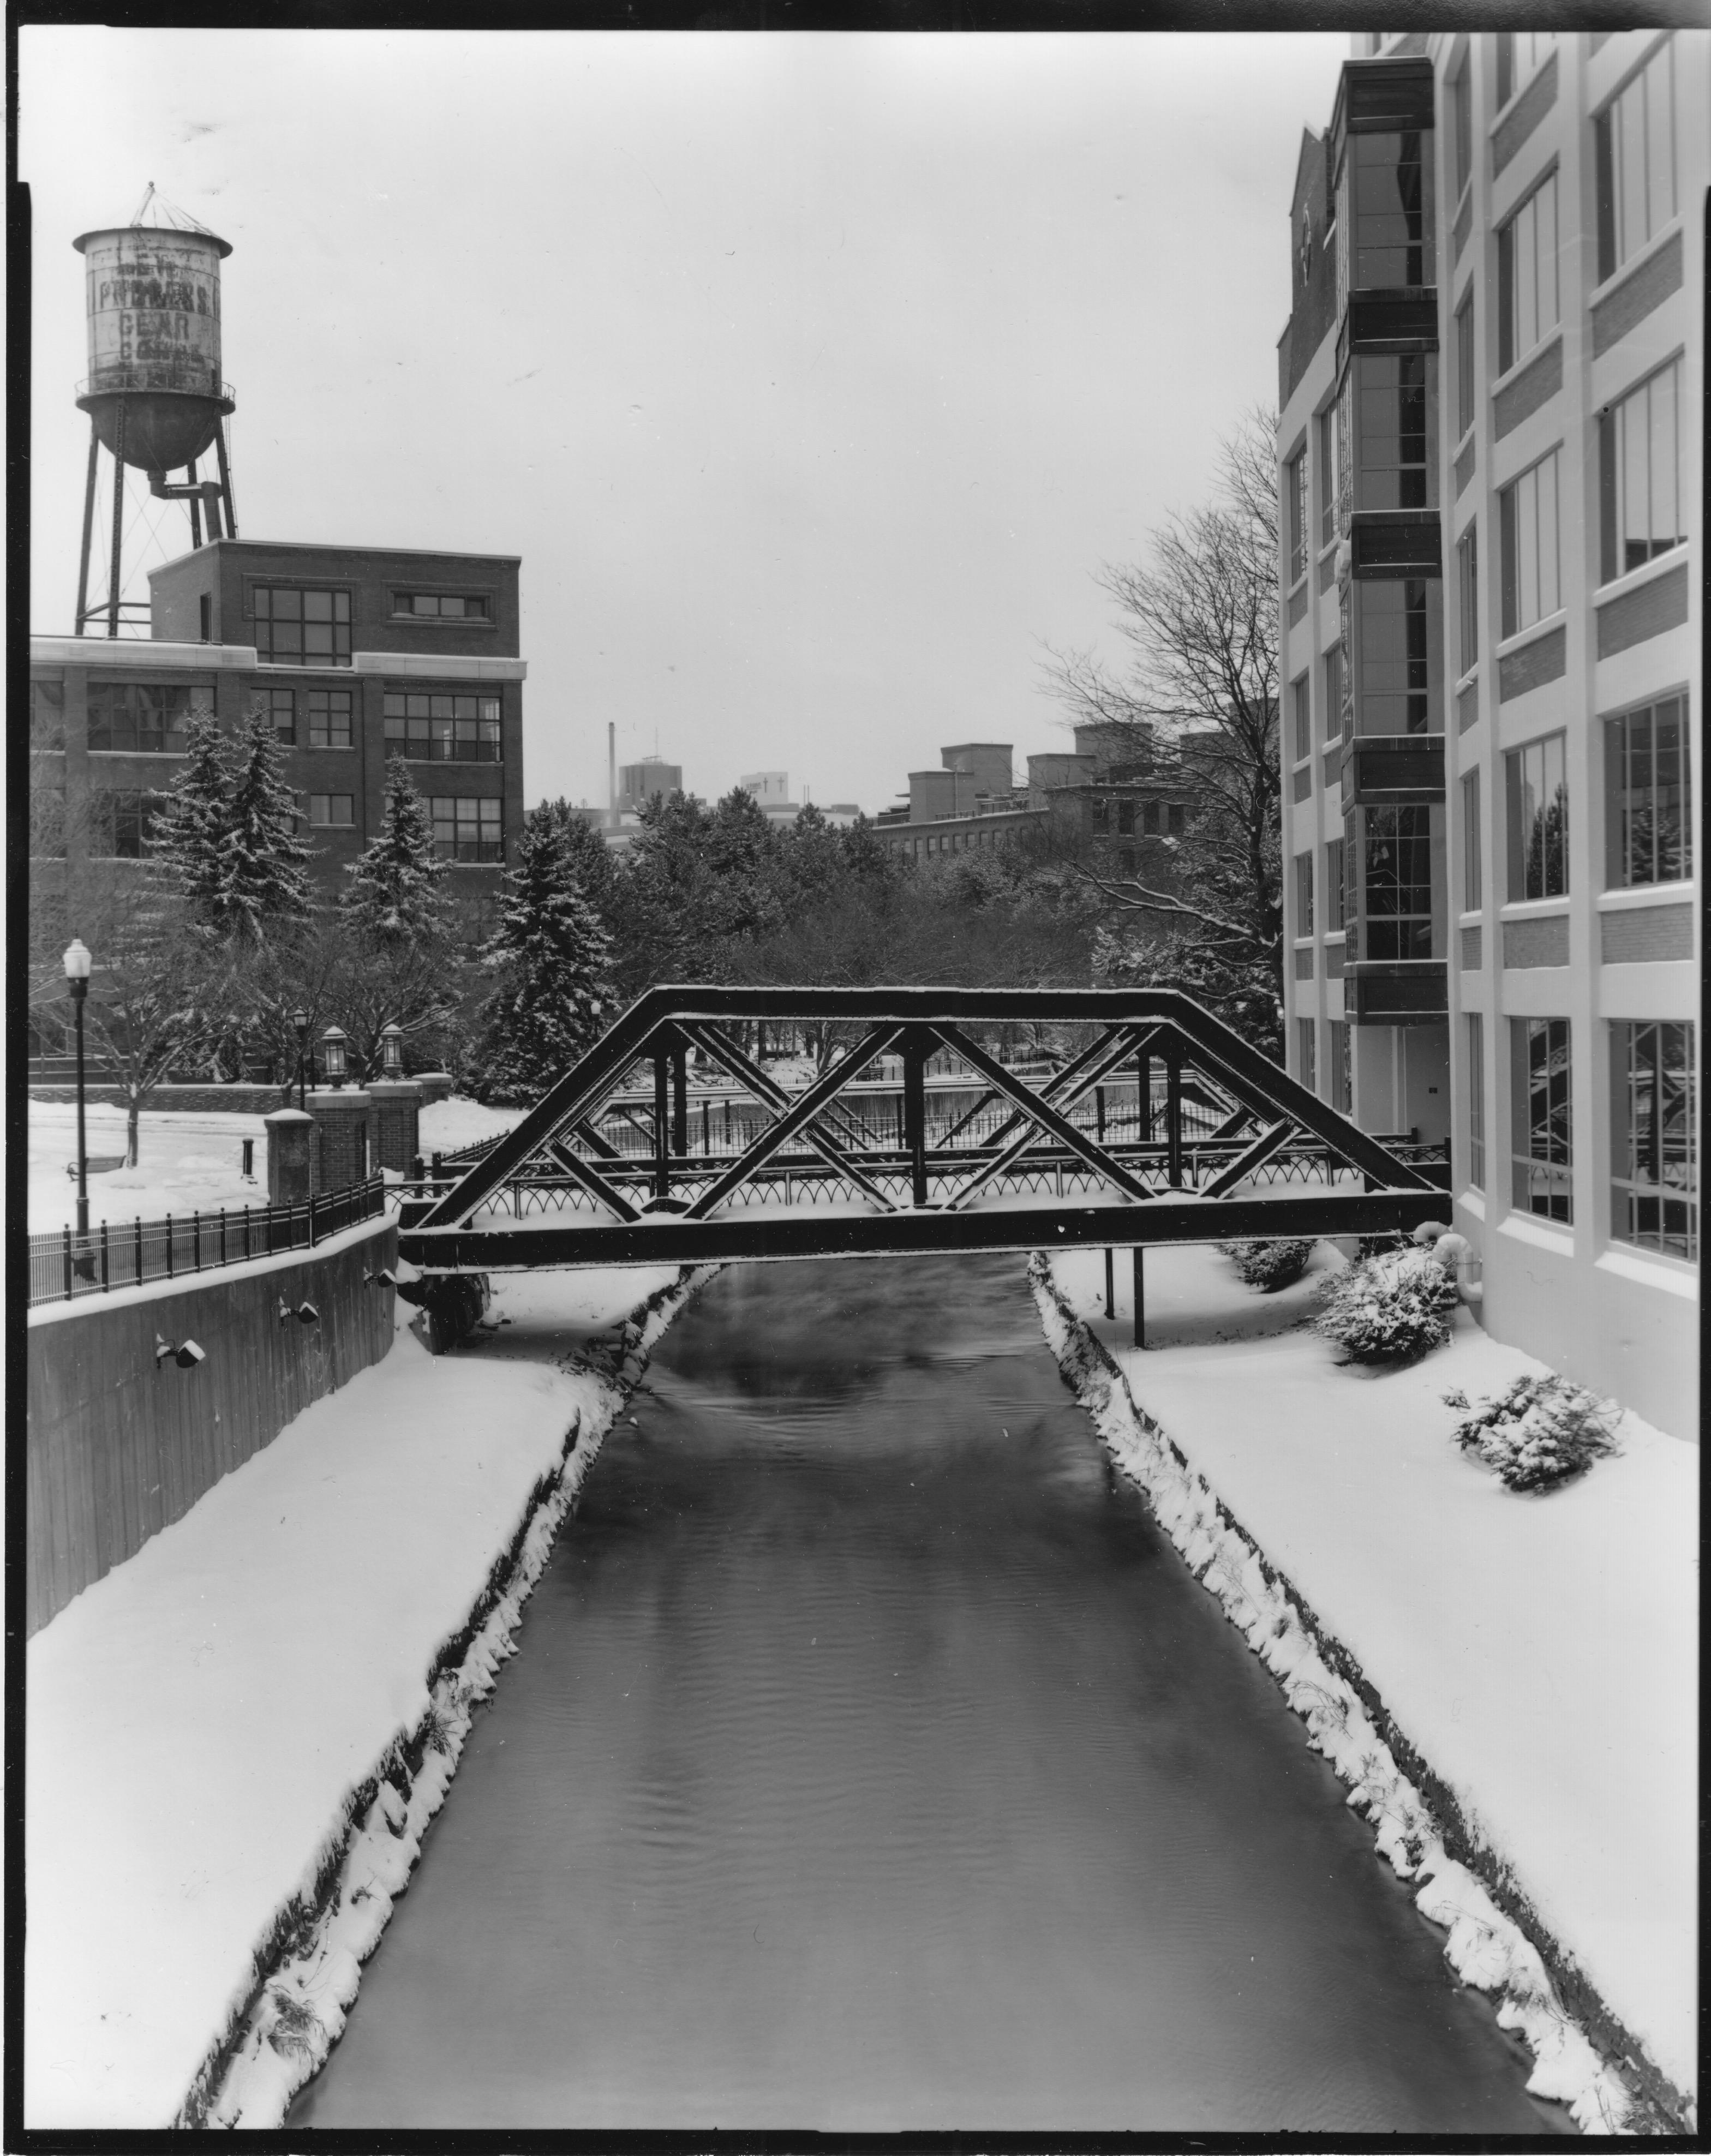 Erie Canal Museum exhibit-2019